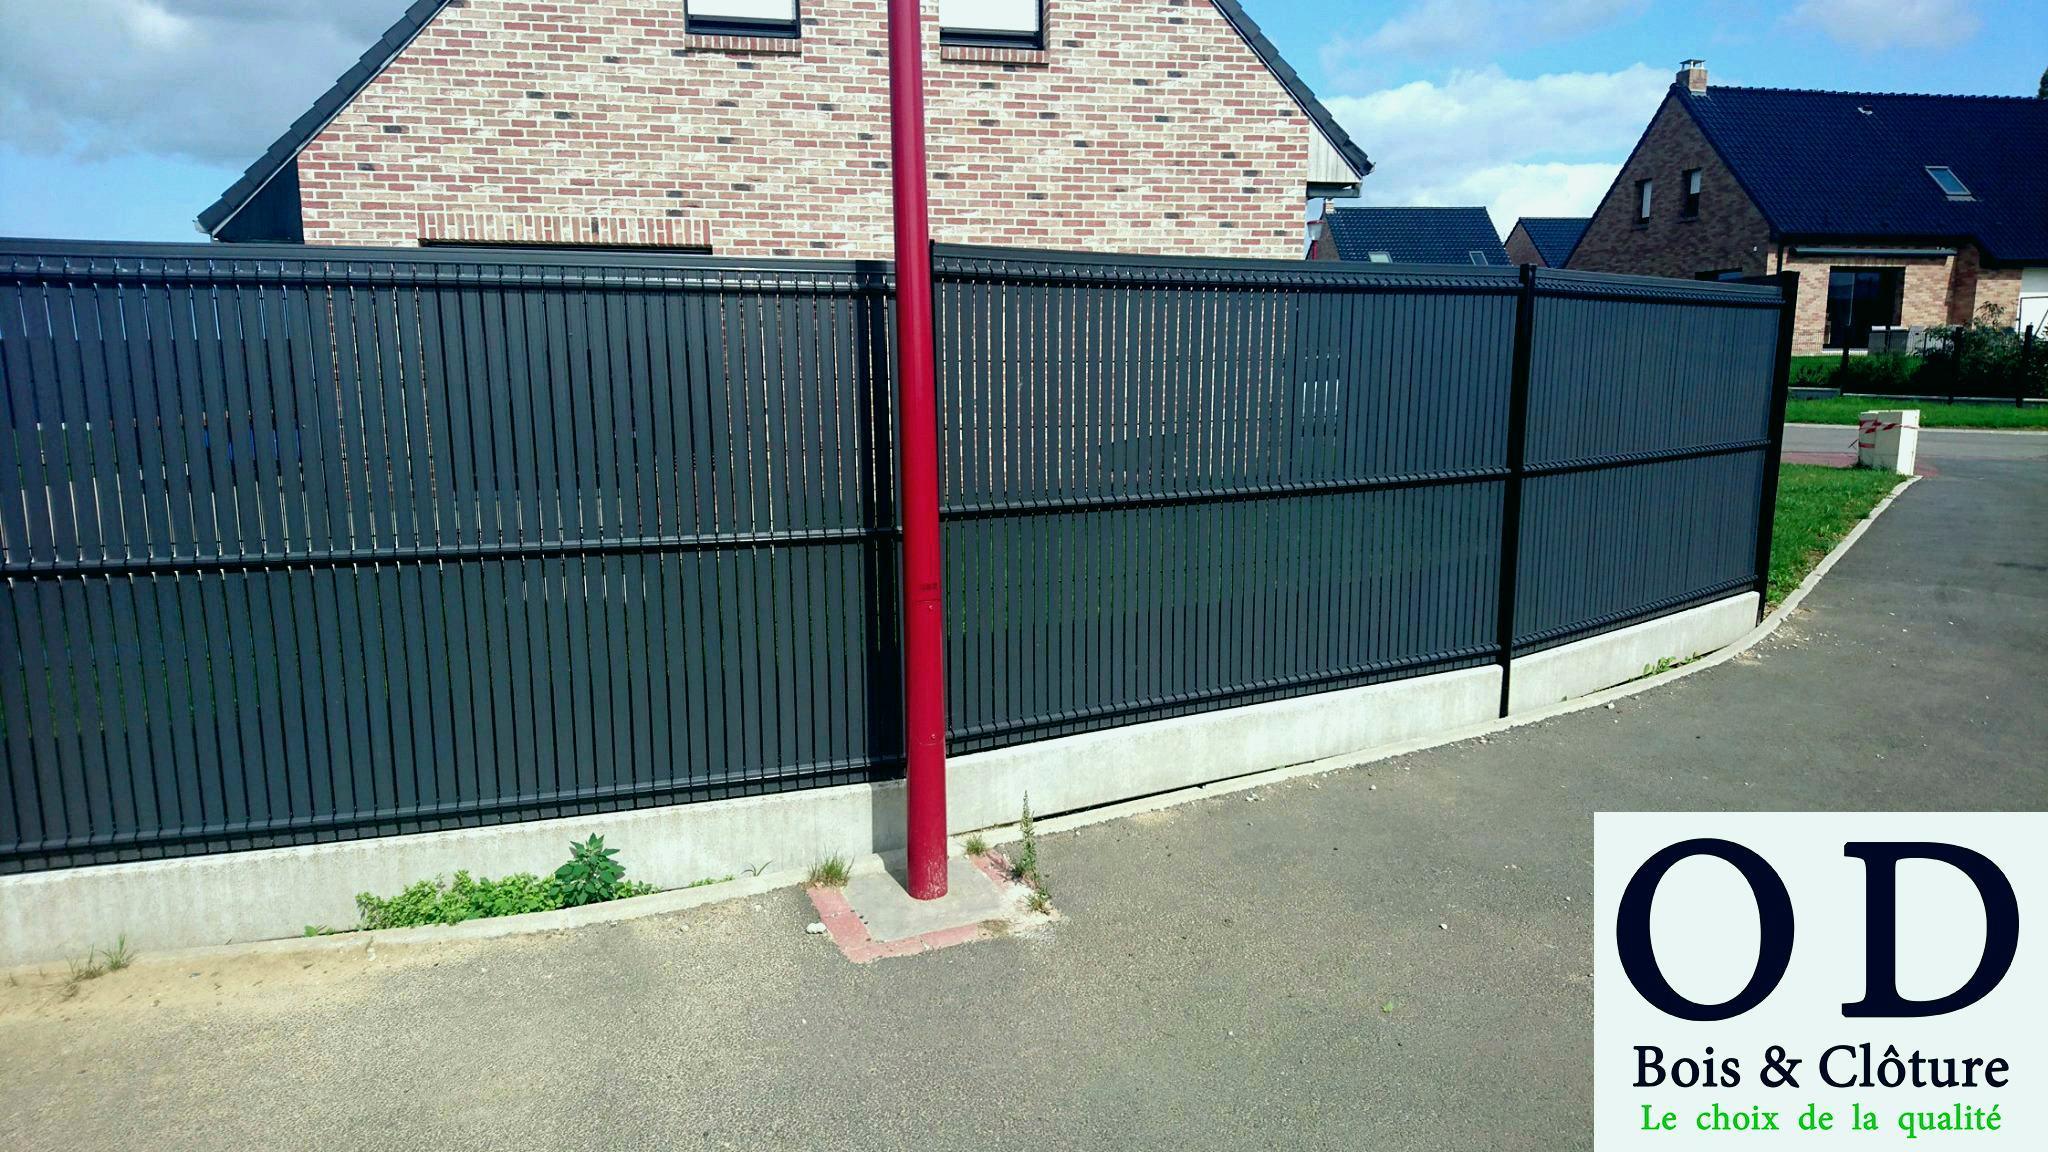 tuile beton prix elegant entretien tuile beton redland luxe s castorama tuile les of tuile beton prix